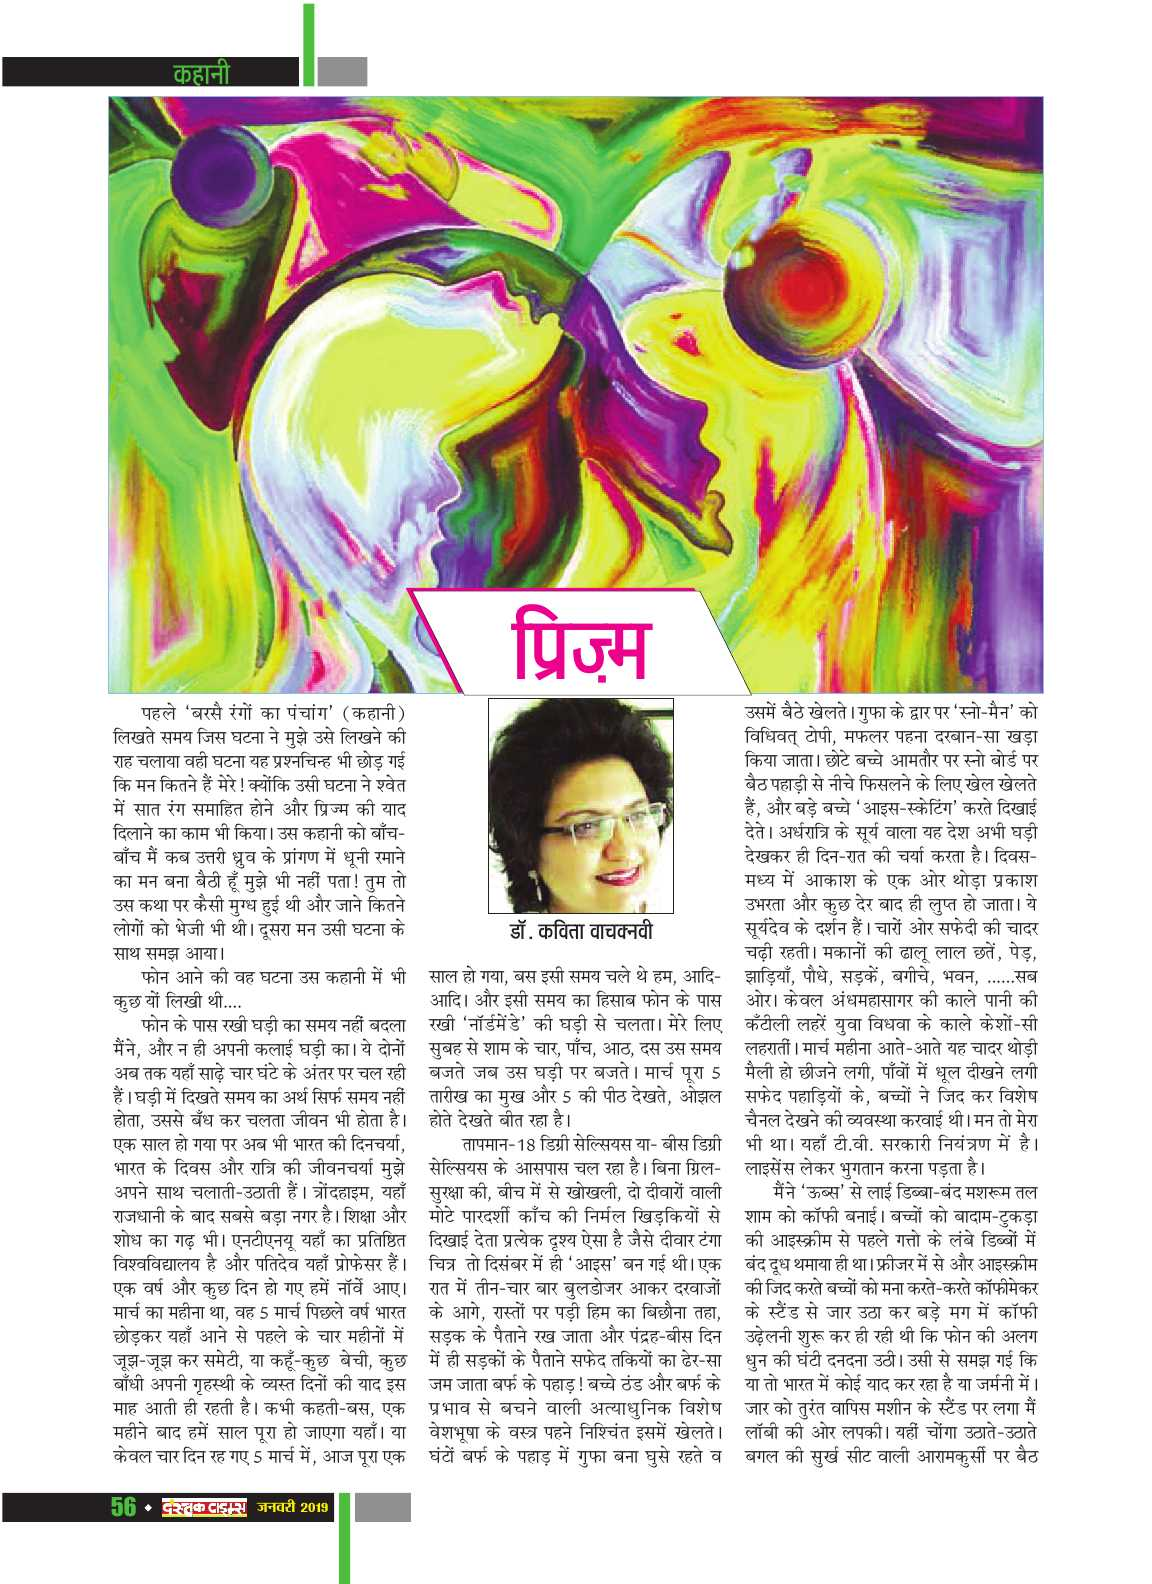 Dastak Times for E-Magazine 15 Jan 2019 new58